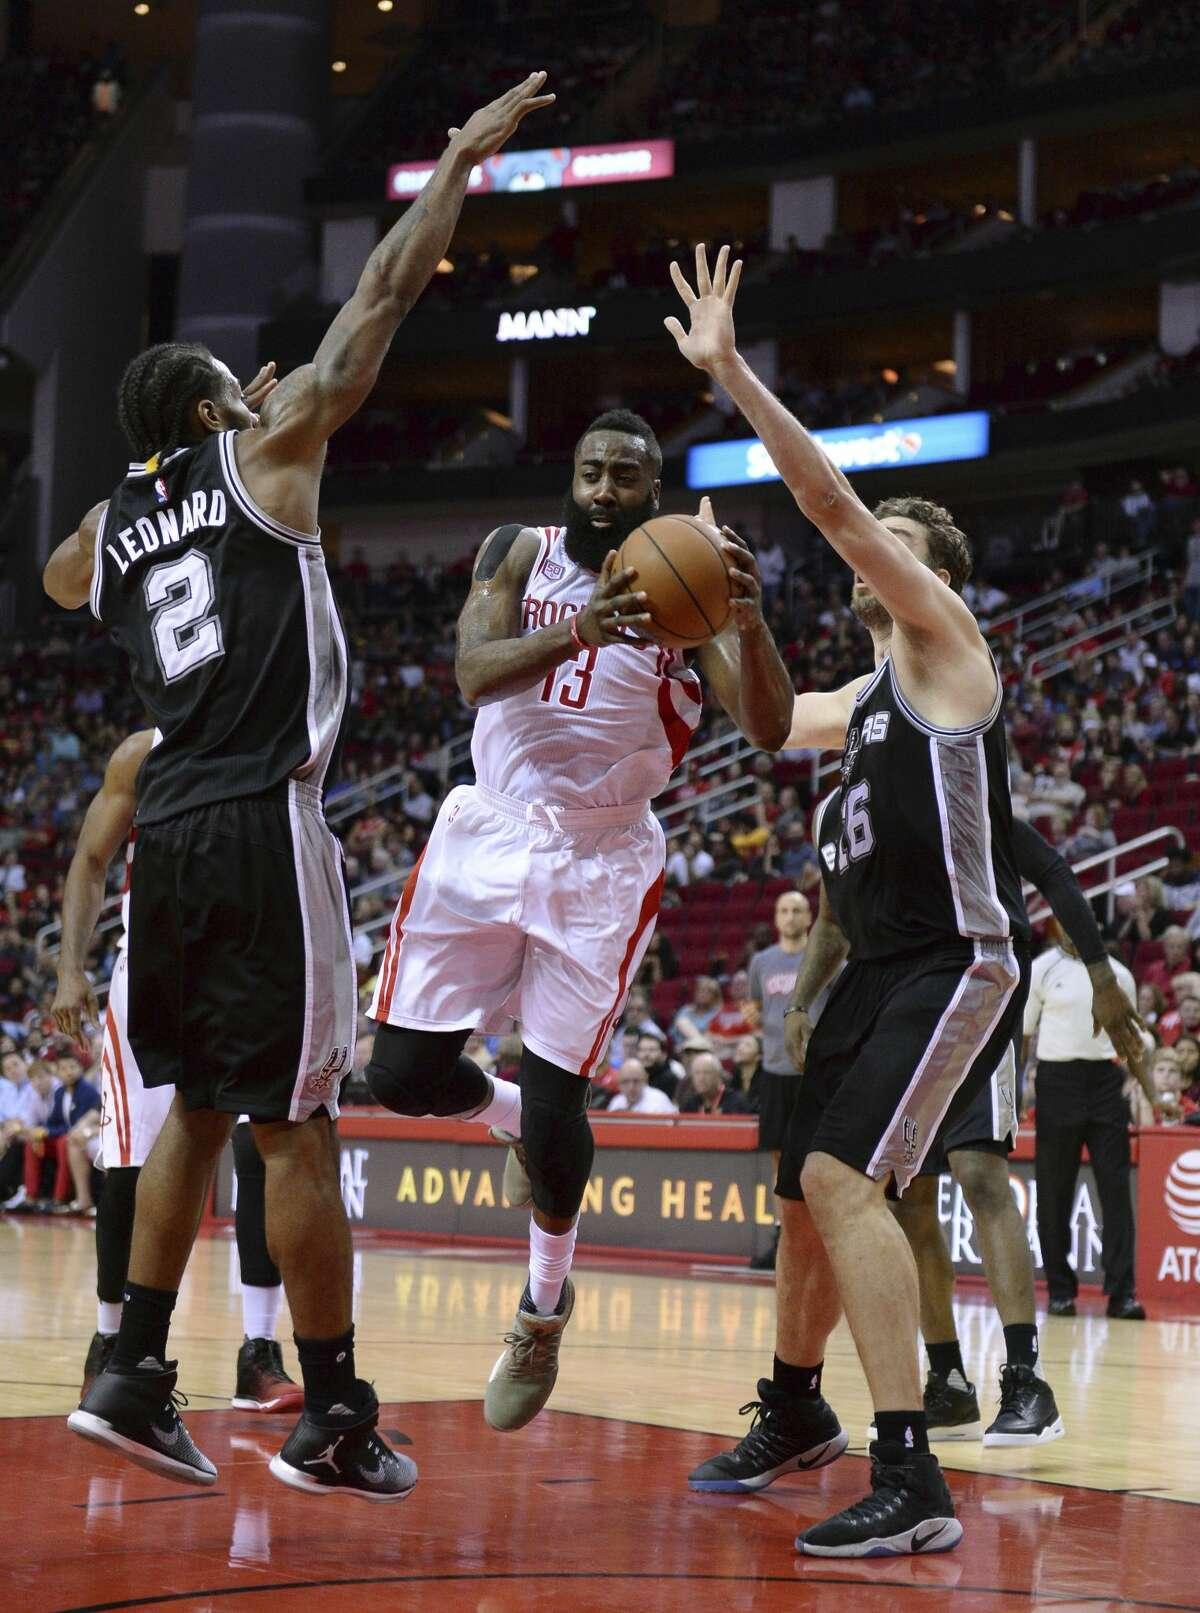 Houston Rockets guard James Harden (13) looks to pass against San Antonio Spurs forward Kawhi Leonard (2) and Pau Gasol (16) in the first half of an NBA basketball game on Saturday, Nov. 12, 2016, in Houston. (AP Photo/George Bridges)